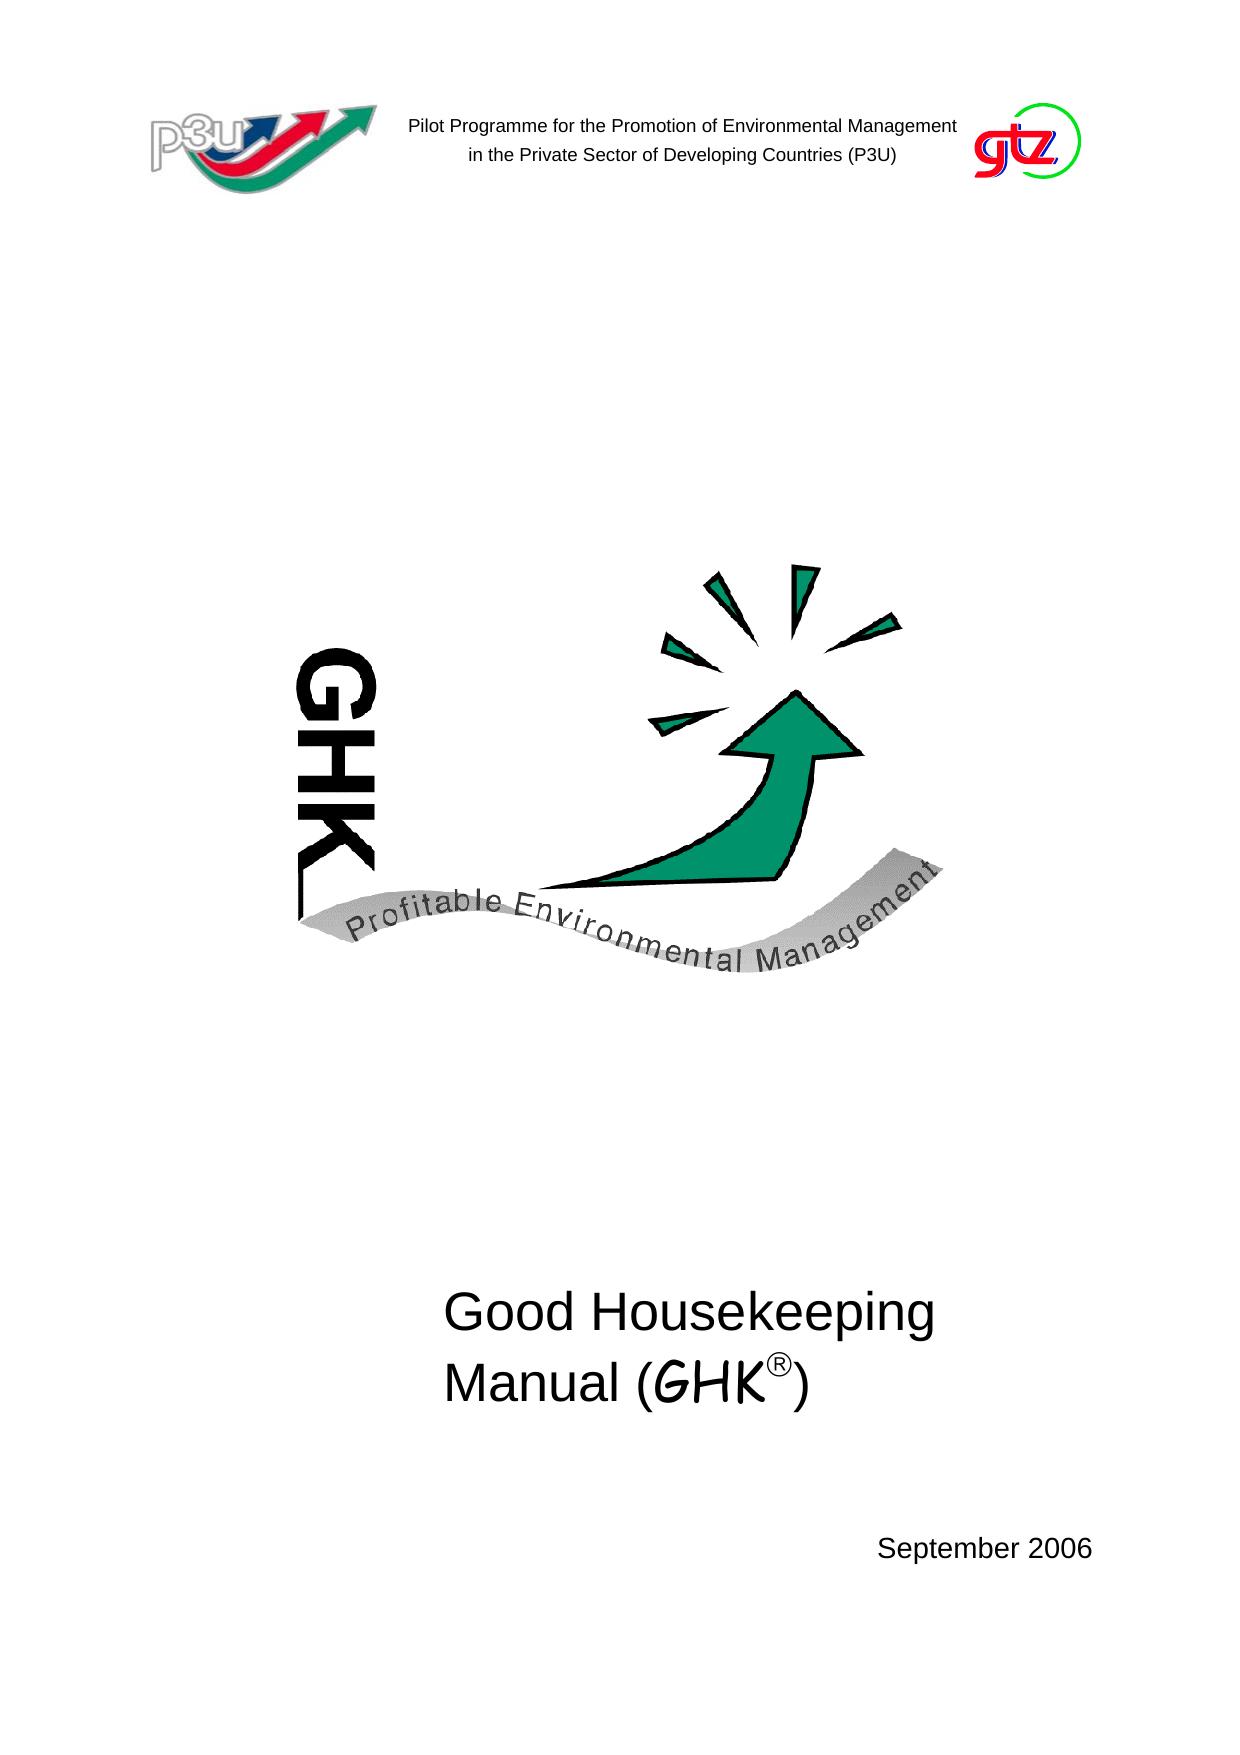 Good Housekeeping Manual